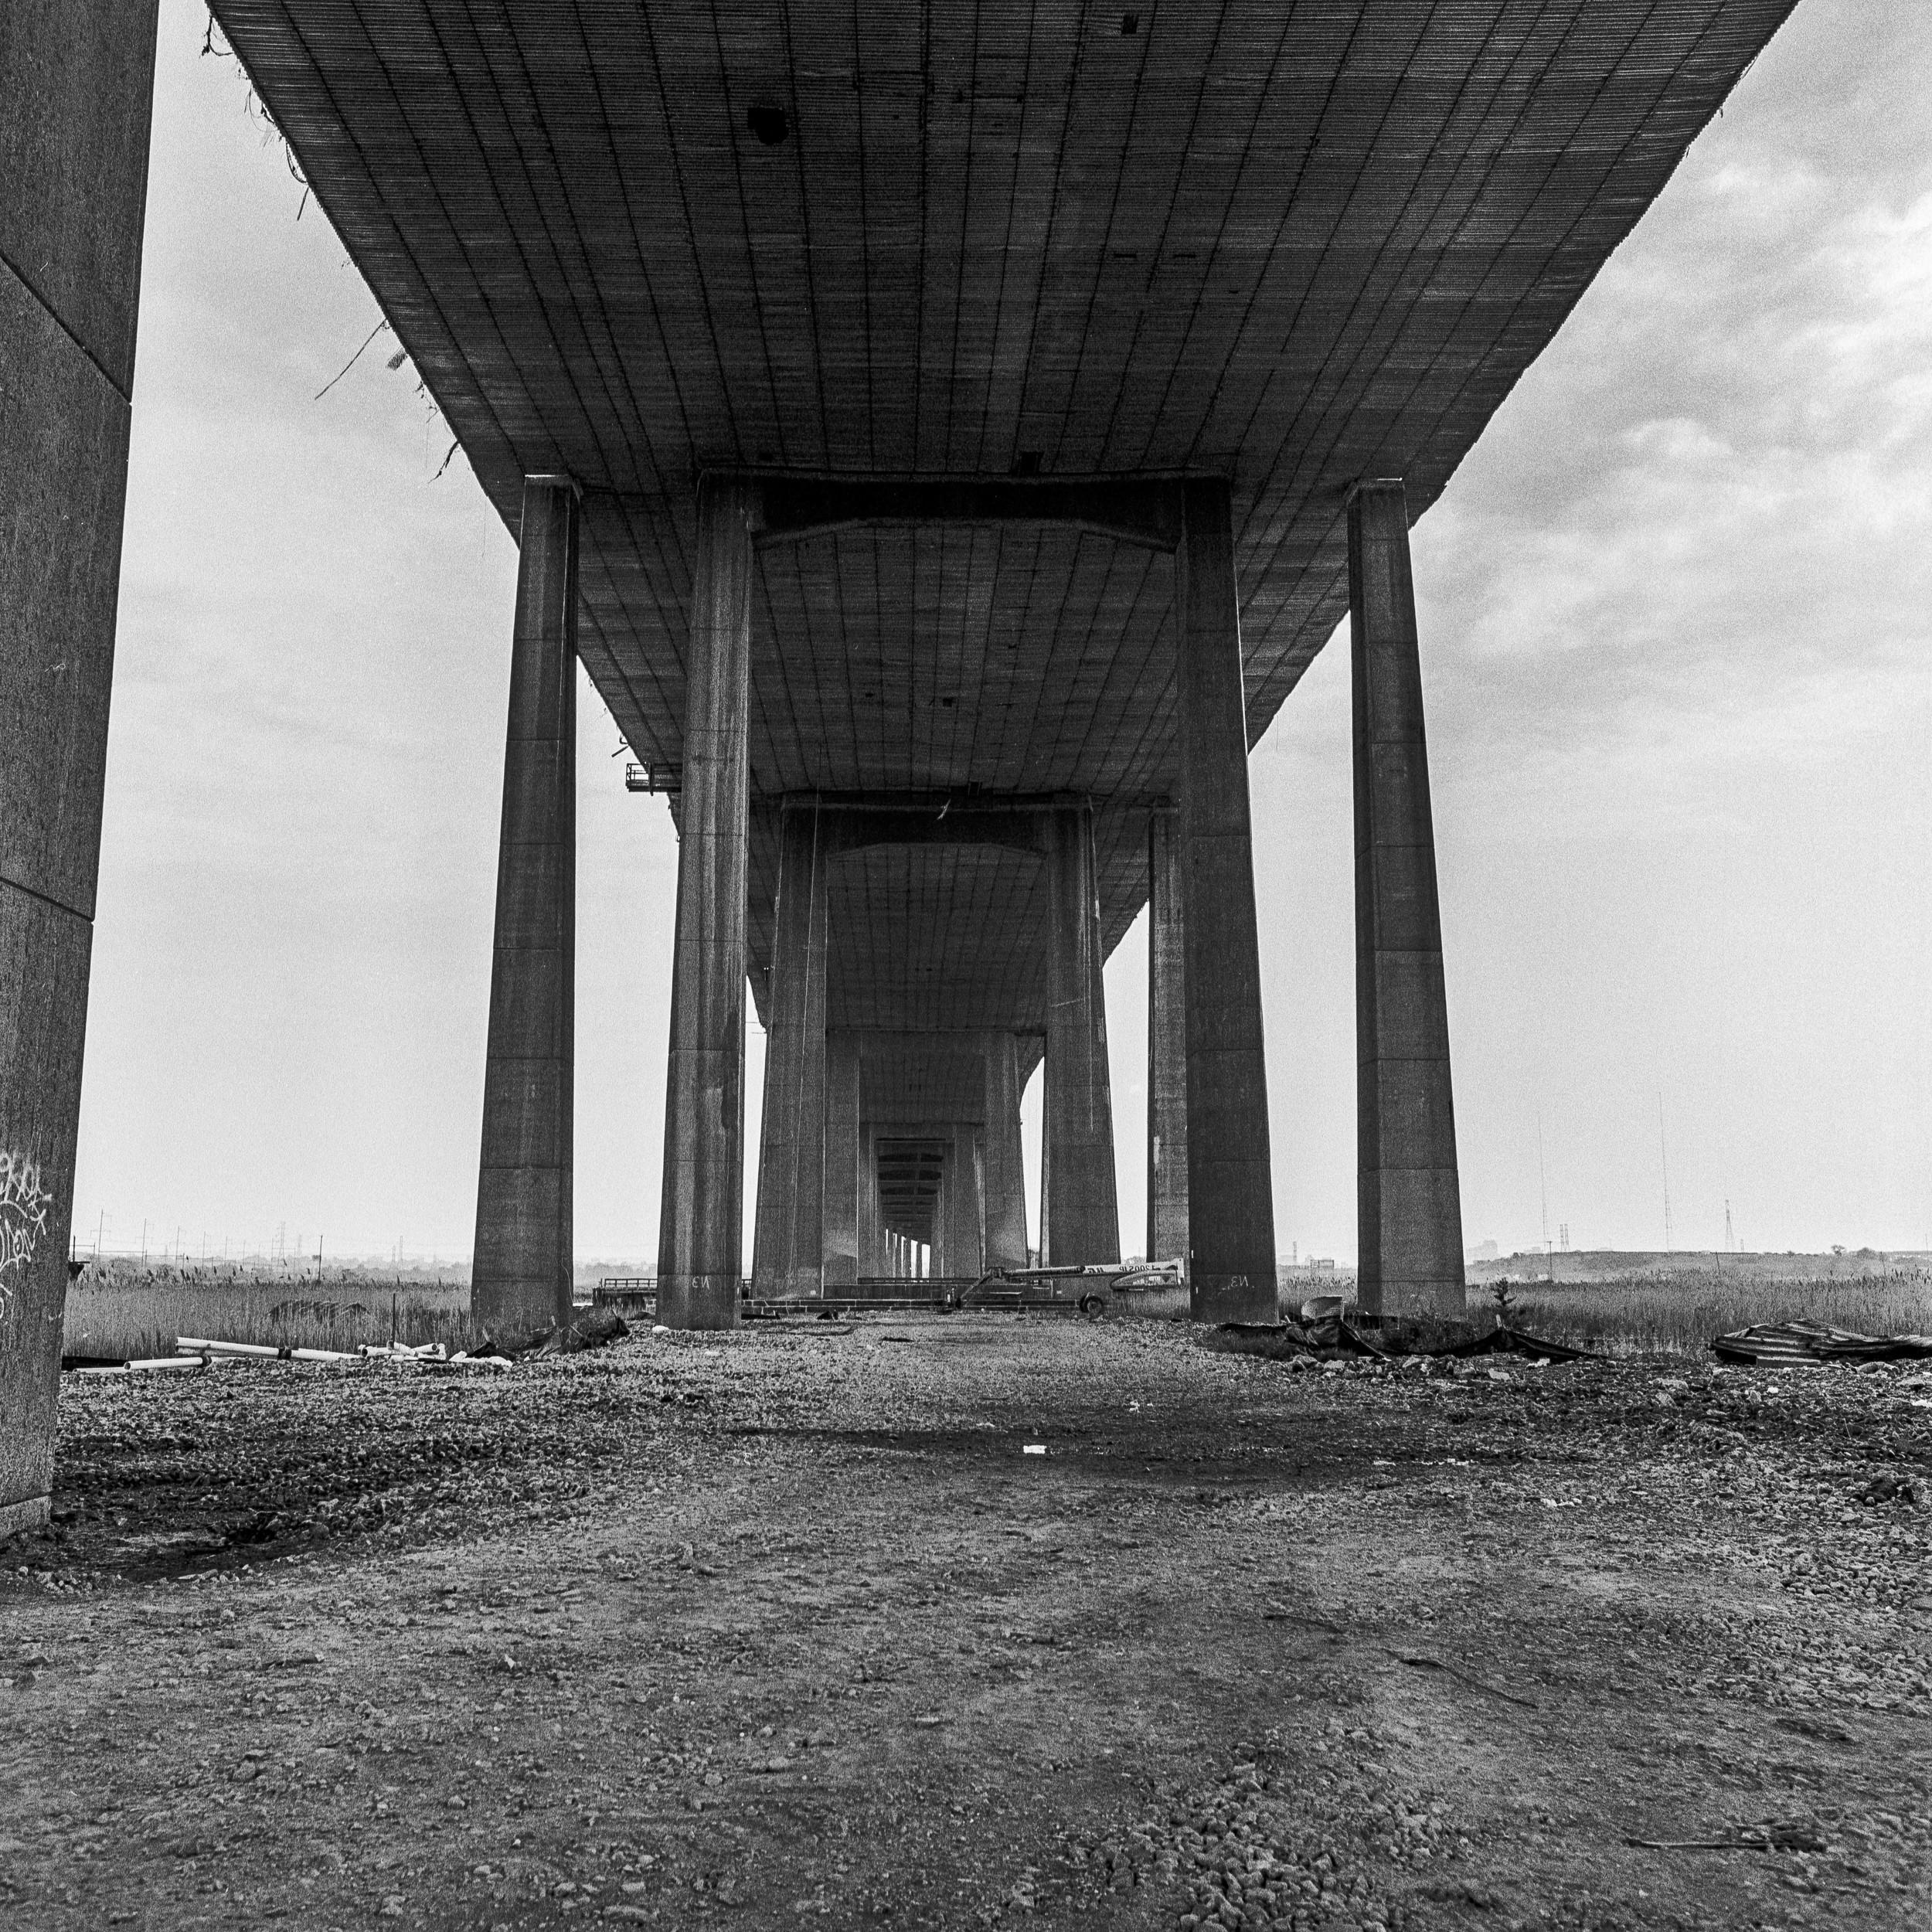 Under the Bridge, Bayonne - 2015